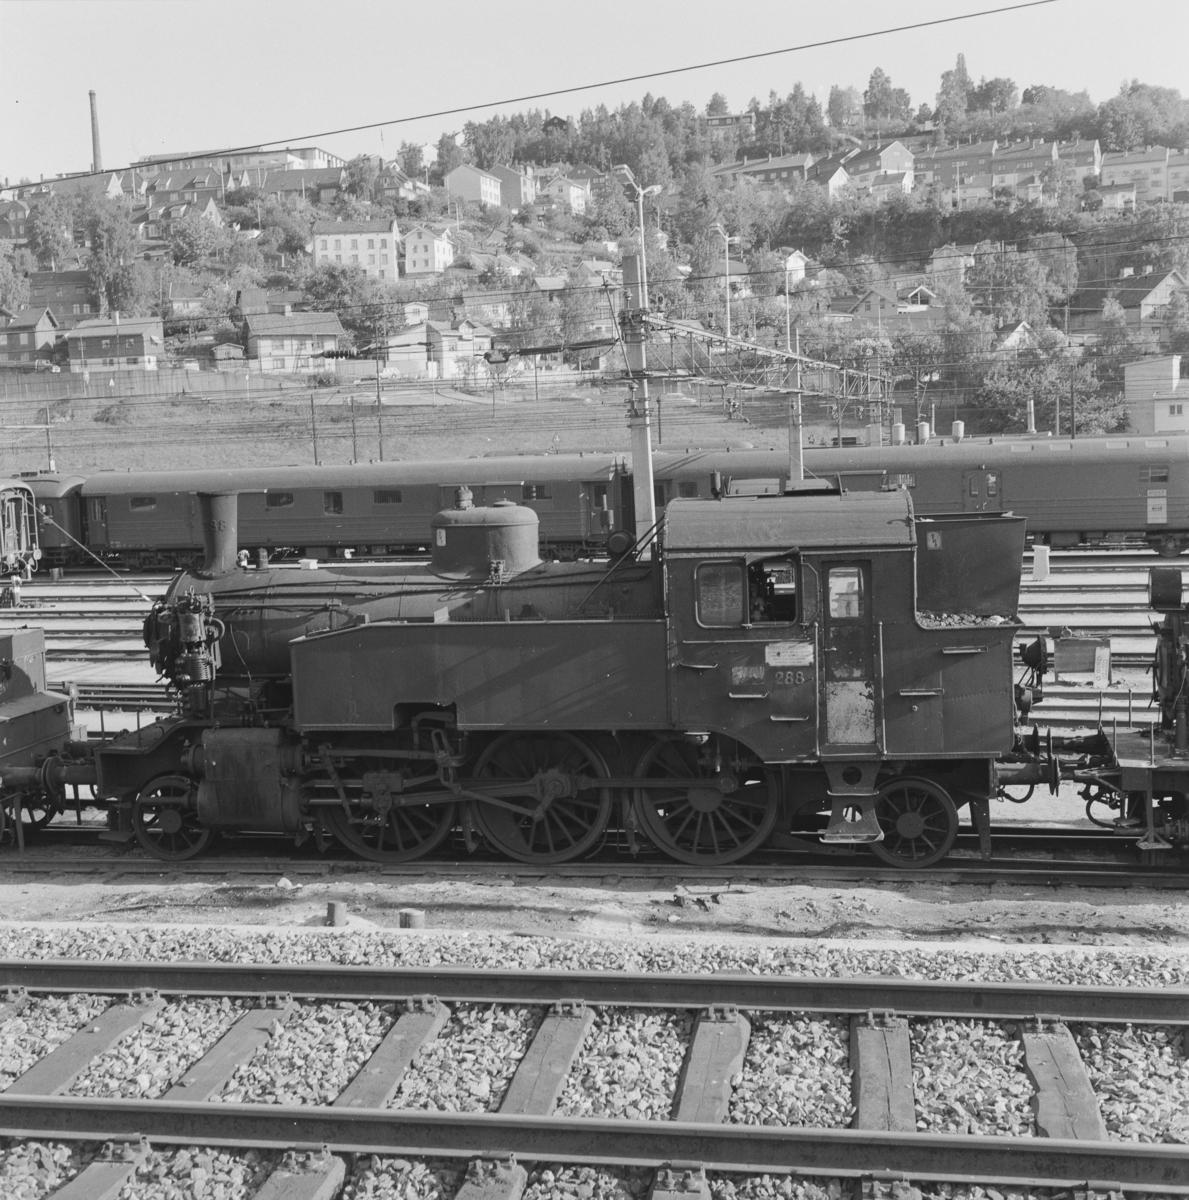 Hensatte damplokomotiver i Lodalen i Oslo.